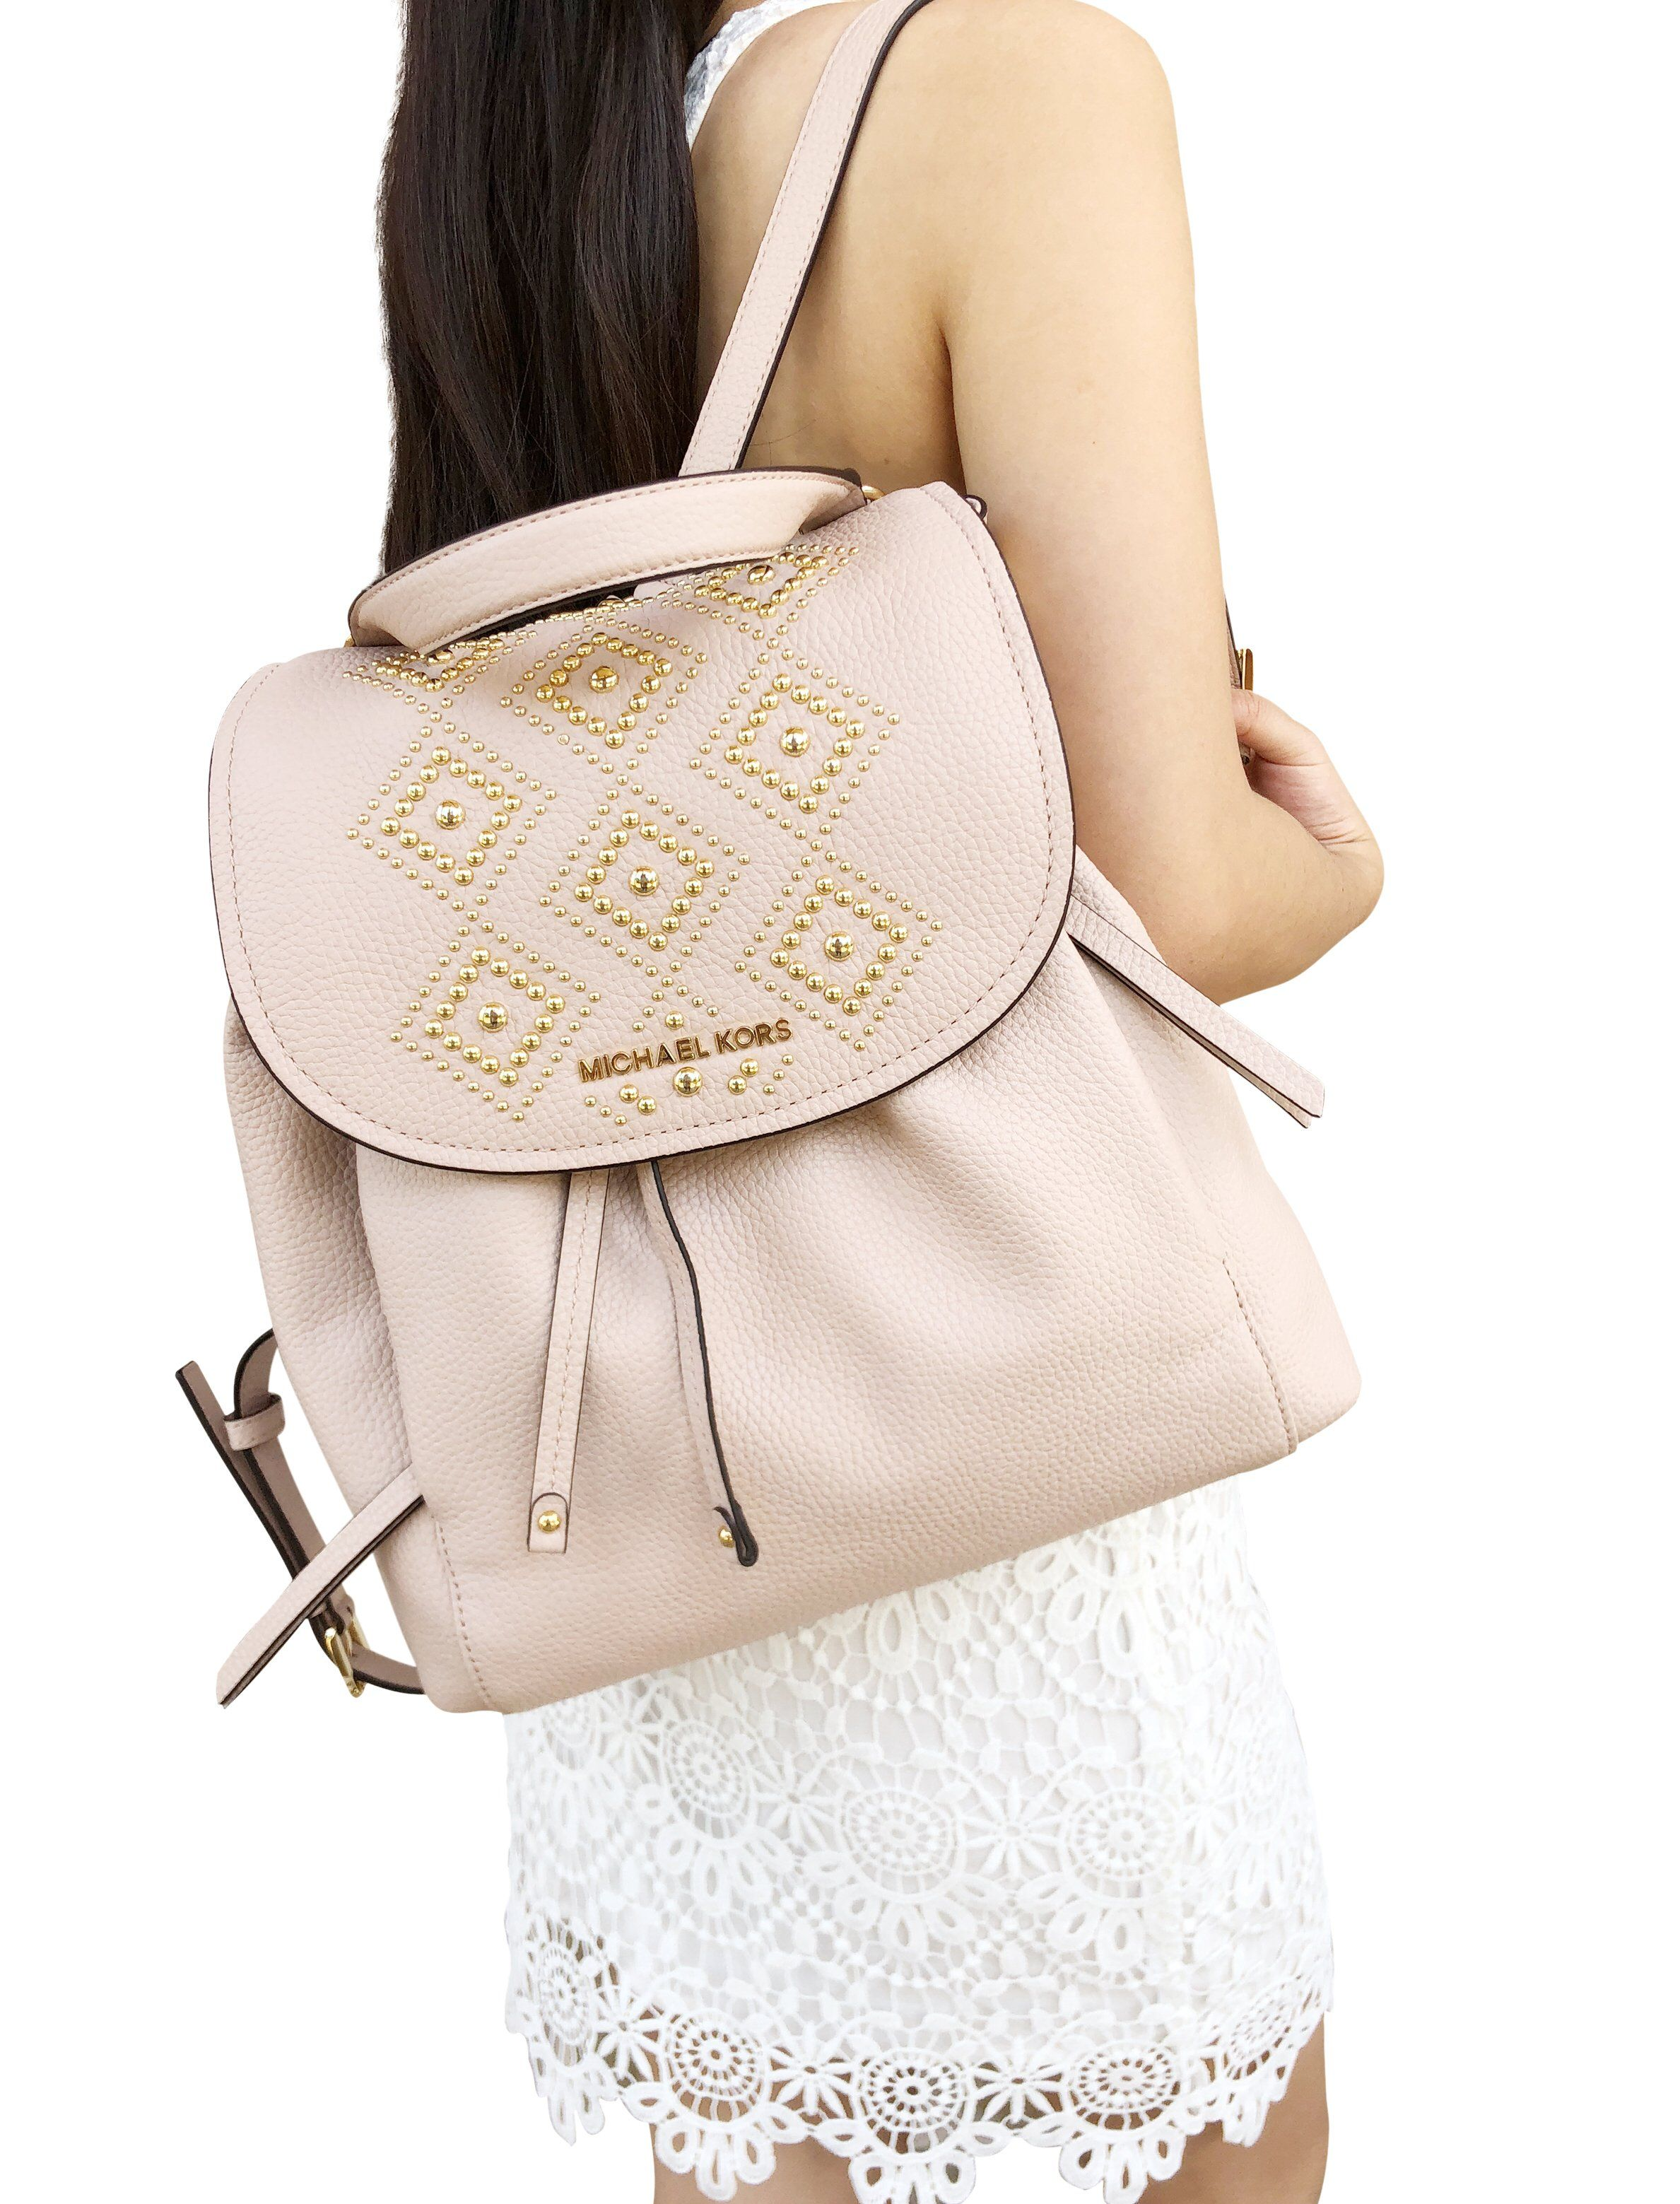 b78863e67b64 Michael Kors Riley Large Backpack Ballet Pink Gold Studded Drawstring Flap  #ebaybusiness #tradesyseller #poshmark #posh #poshboss #poshpackages ...